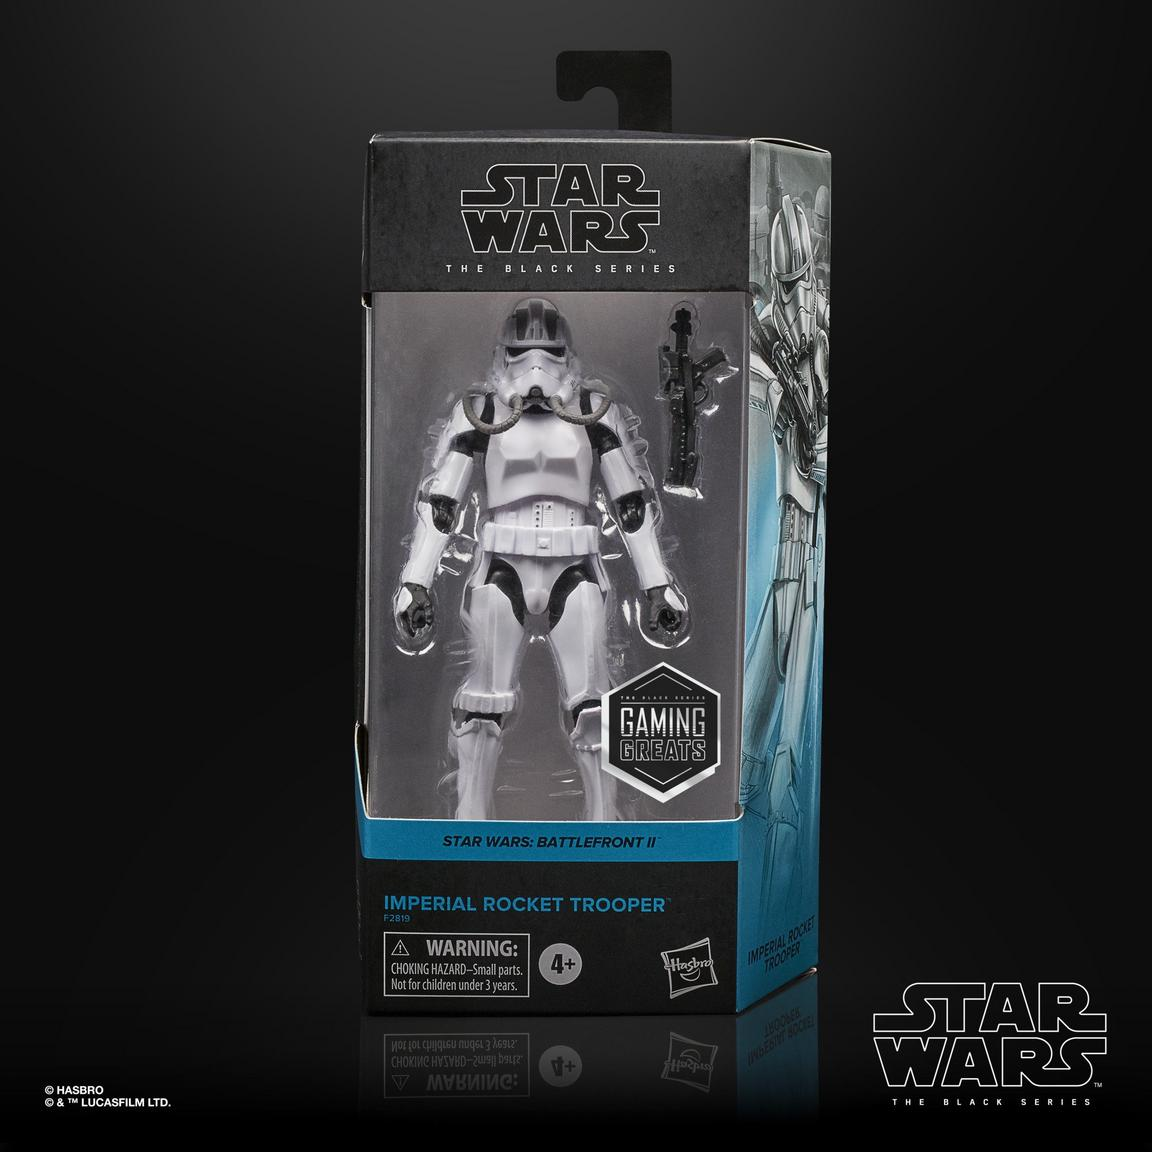 Star Wars The Black Series SWBFII Imperial Rocket Trooper 6-inch Action Figure画像